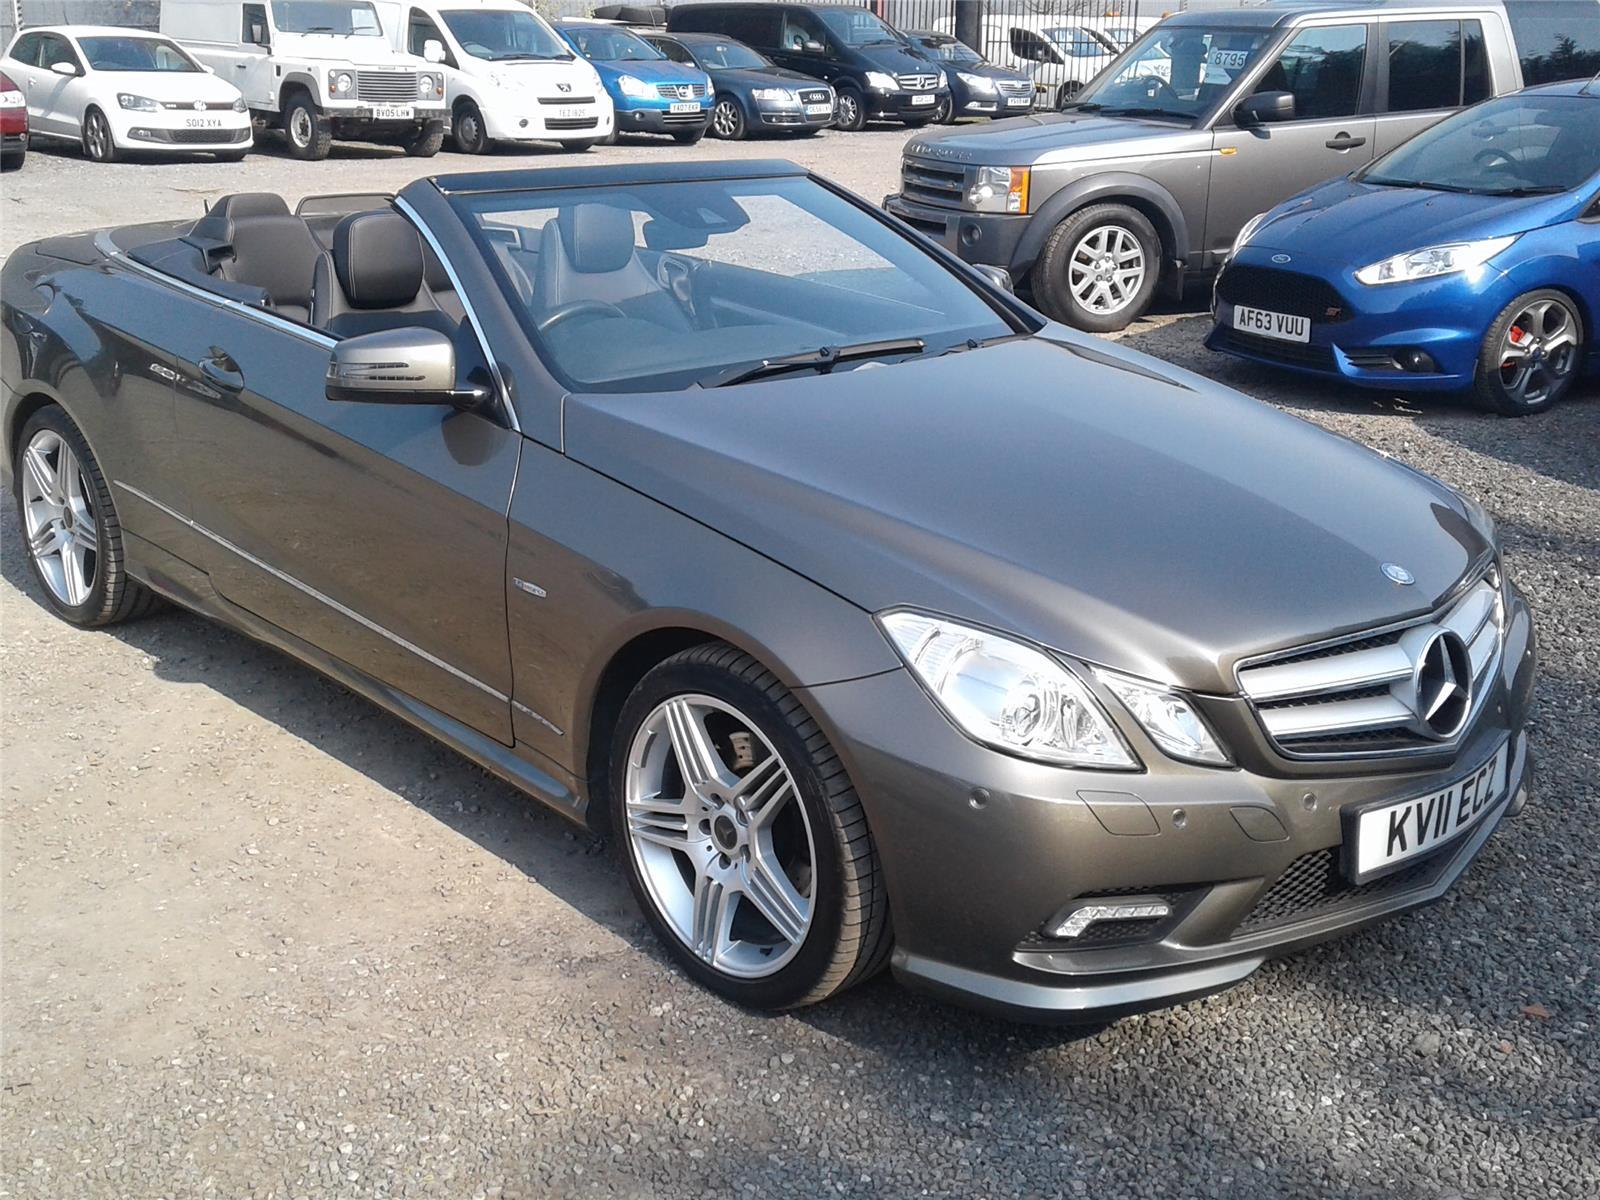 2011 Mercedes-Benz E Class E250 Sport CDi BlueEfficiency 2143 Diesel Automatic 5 Speed 2 Door Cabriolet